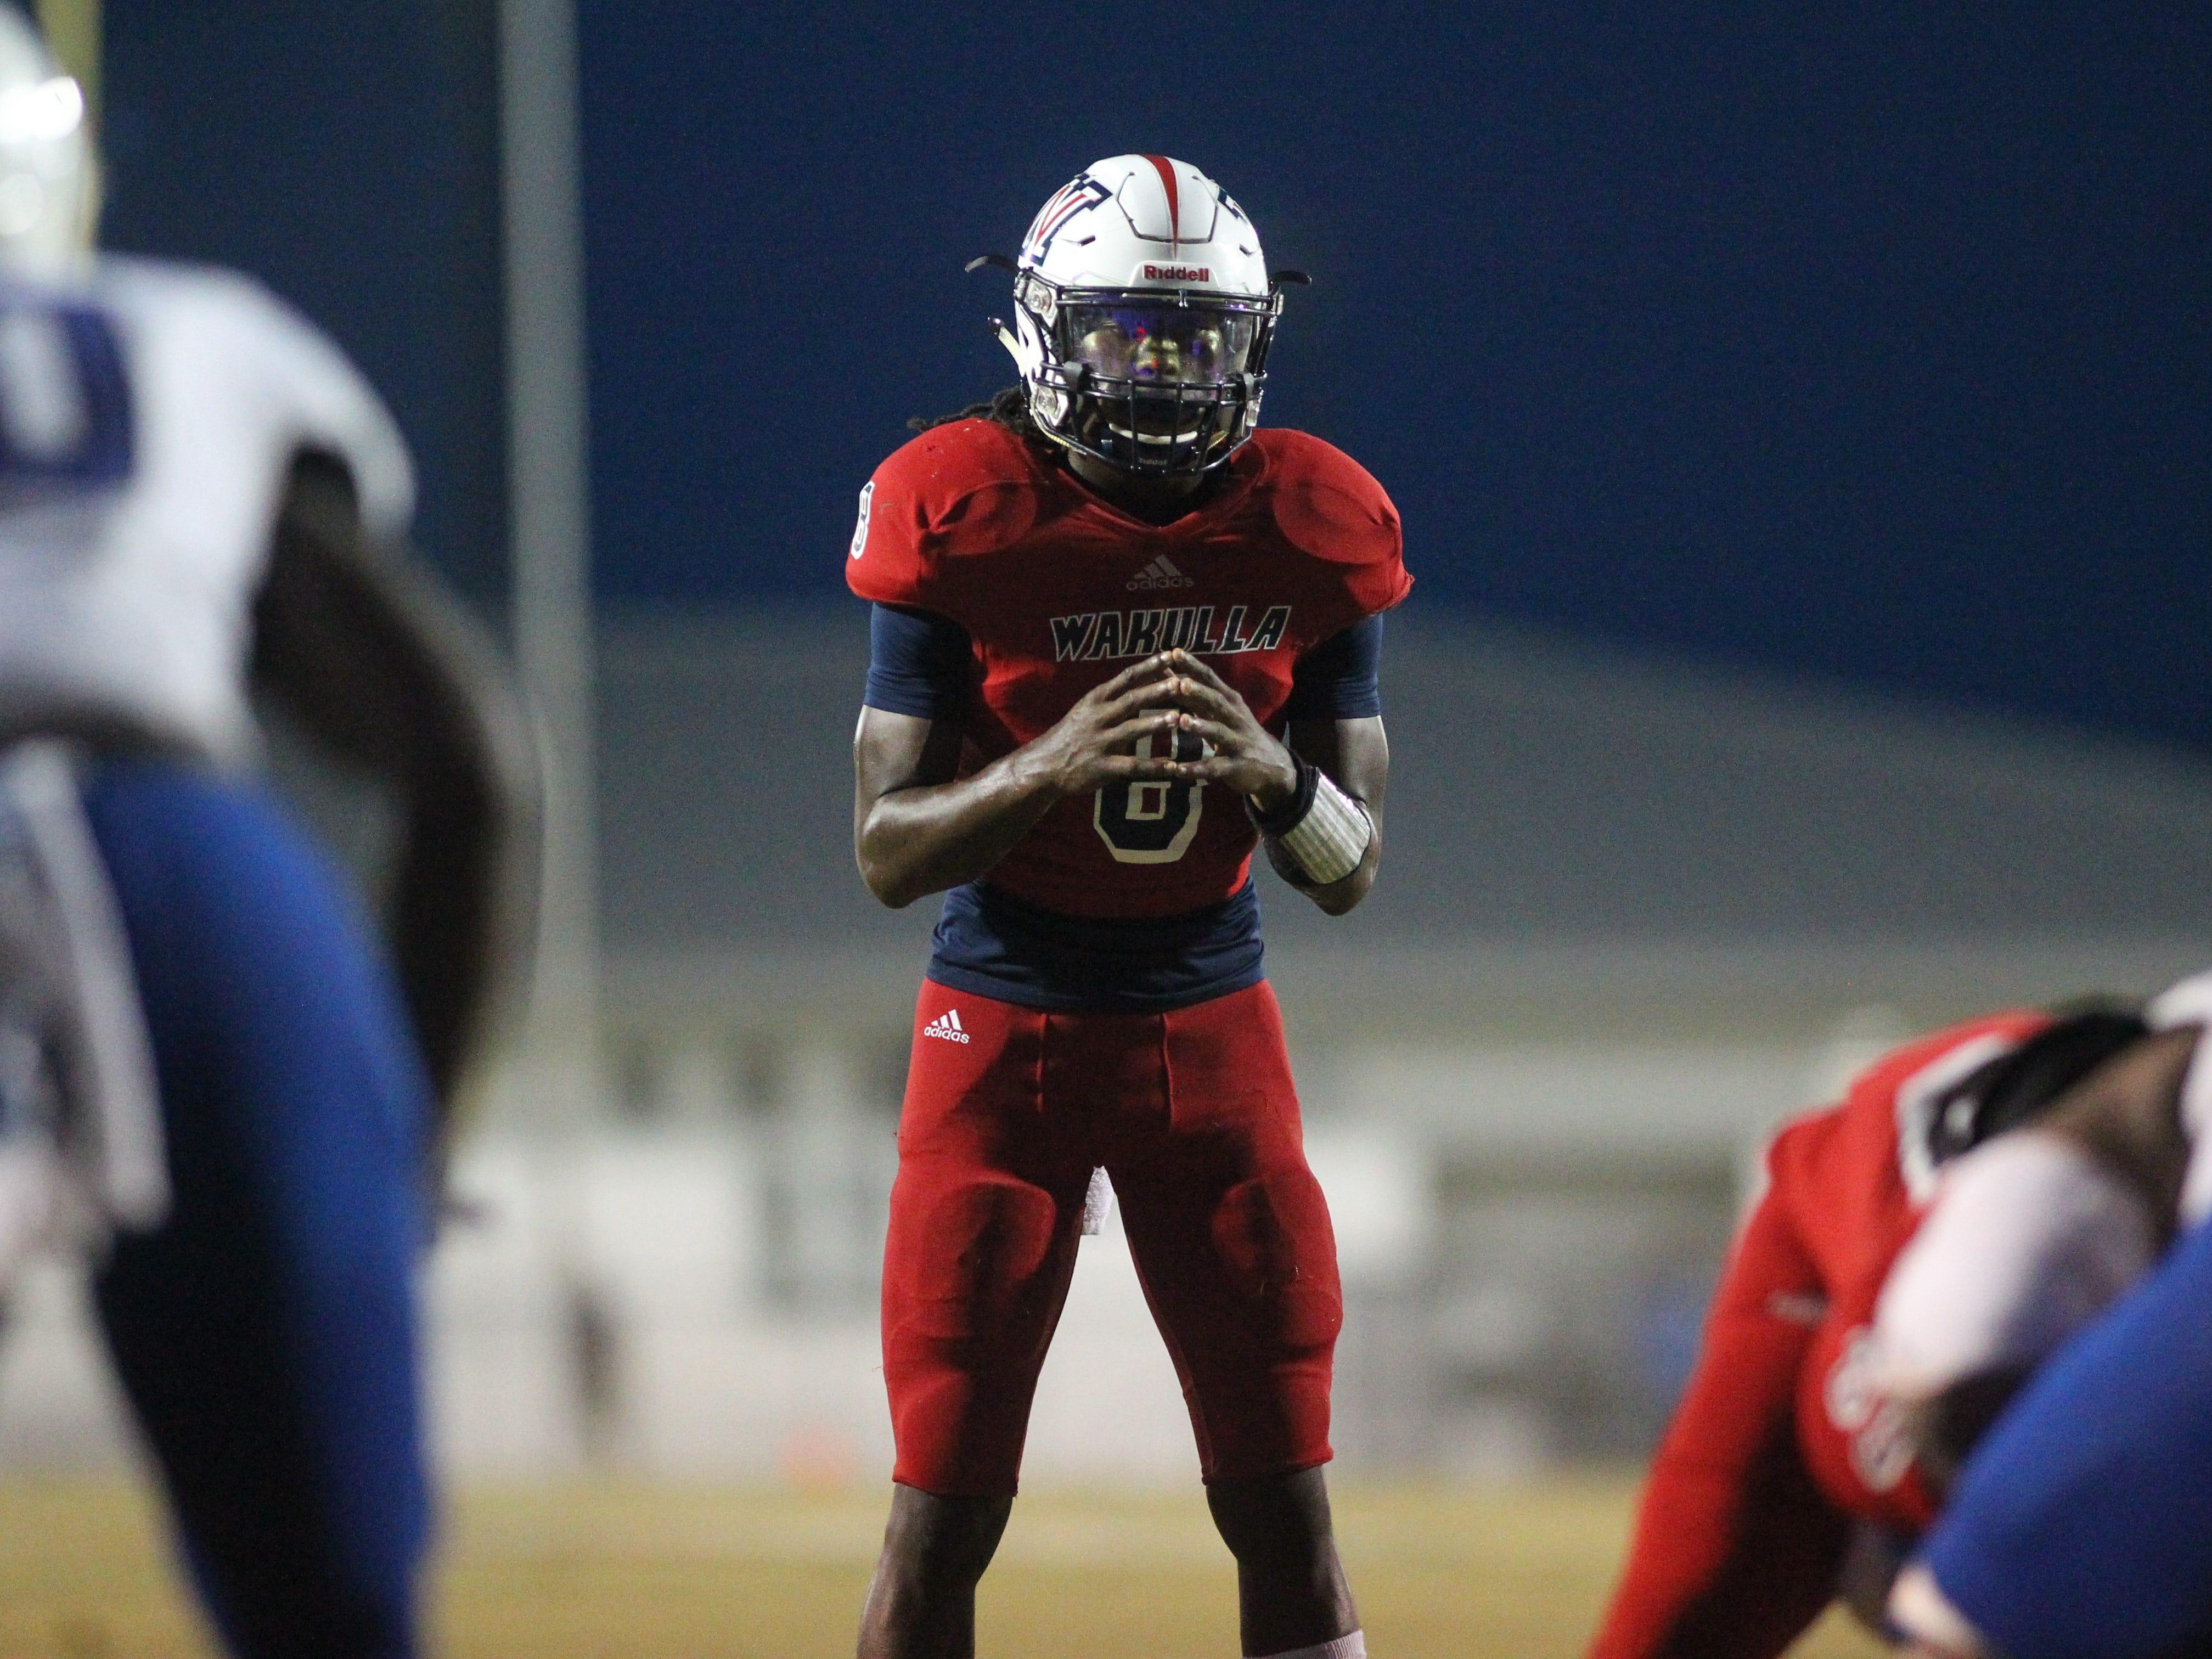 Wakulla quarterback Jaylon Worsham readies for a play as Godby beat Wakulla 37-13 on Friday night.